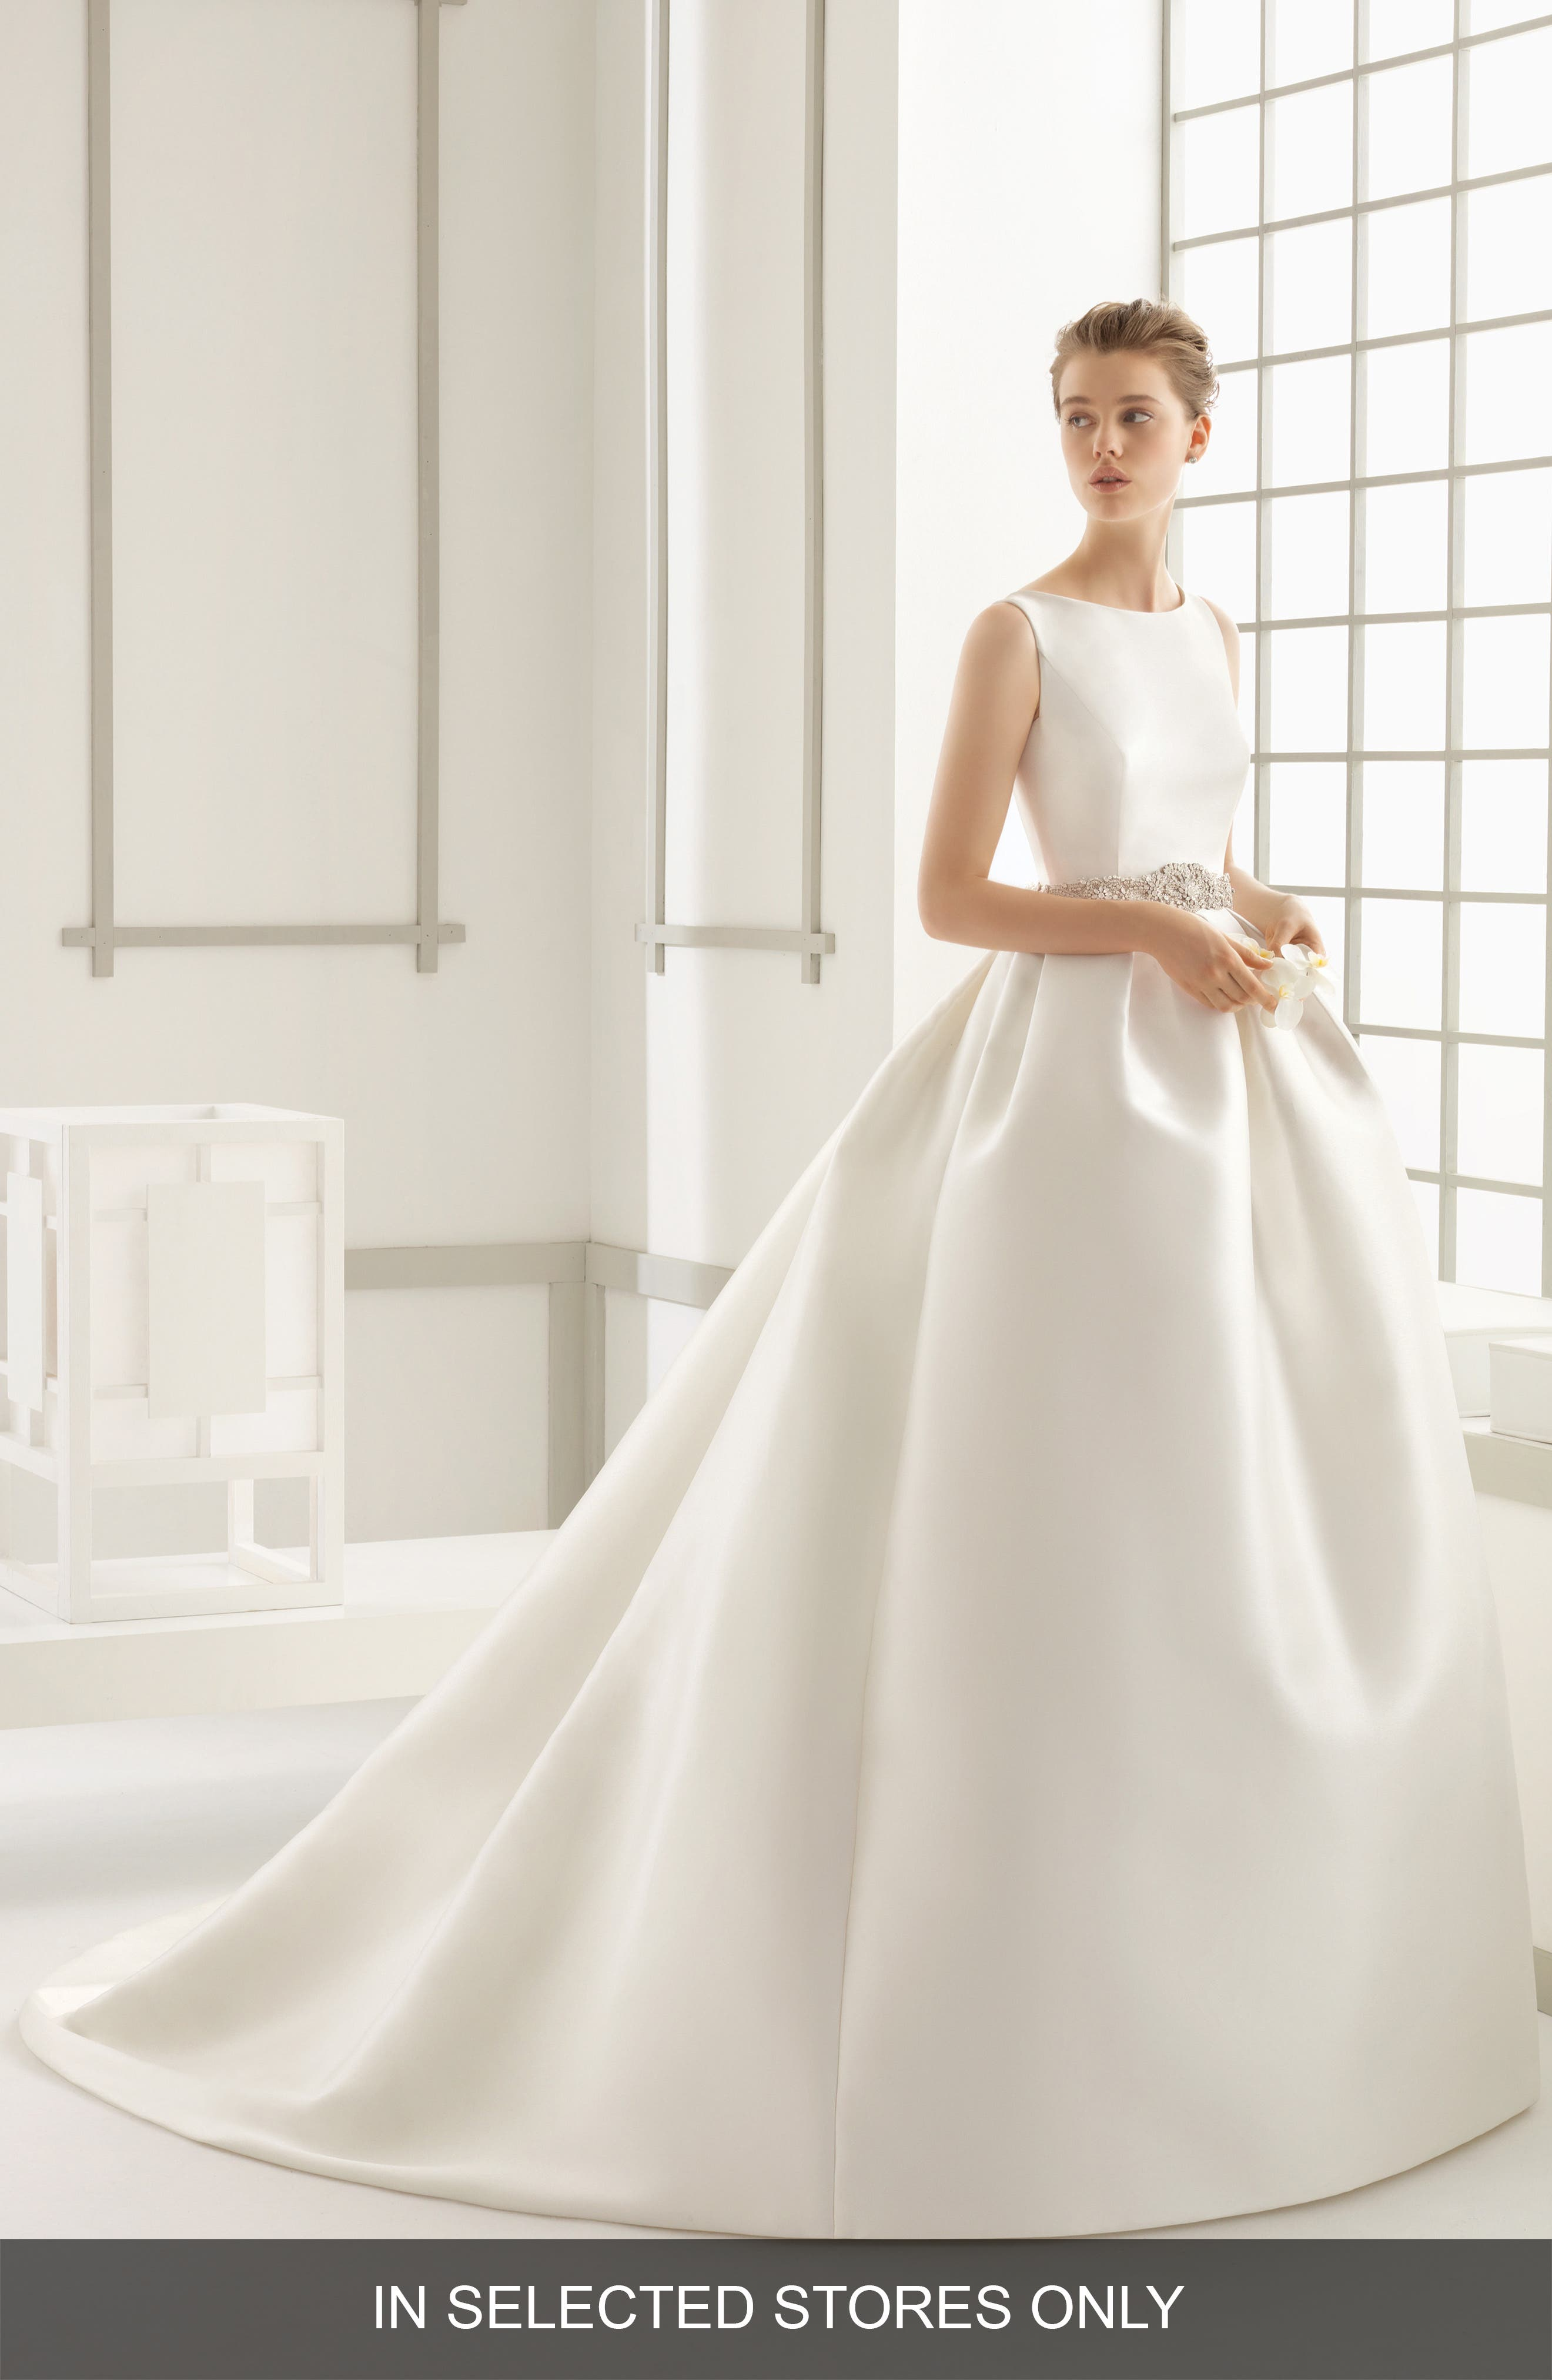 Alternate Image 1 Selected - Rosa Clara Couture Delfos Beaded Back Ballgown Dress